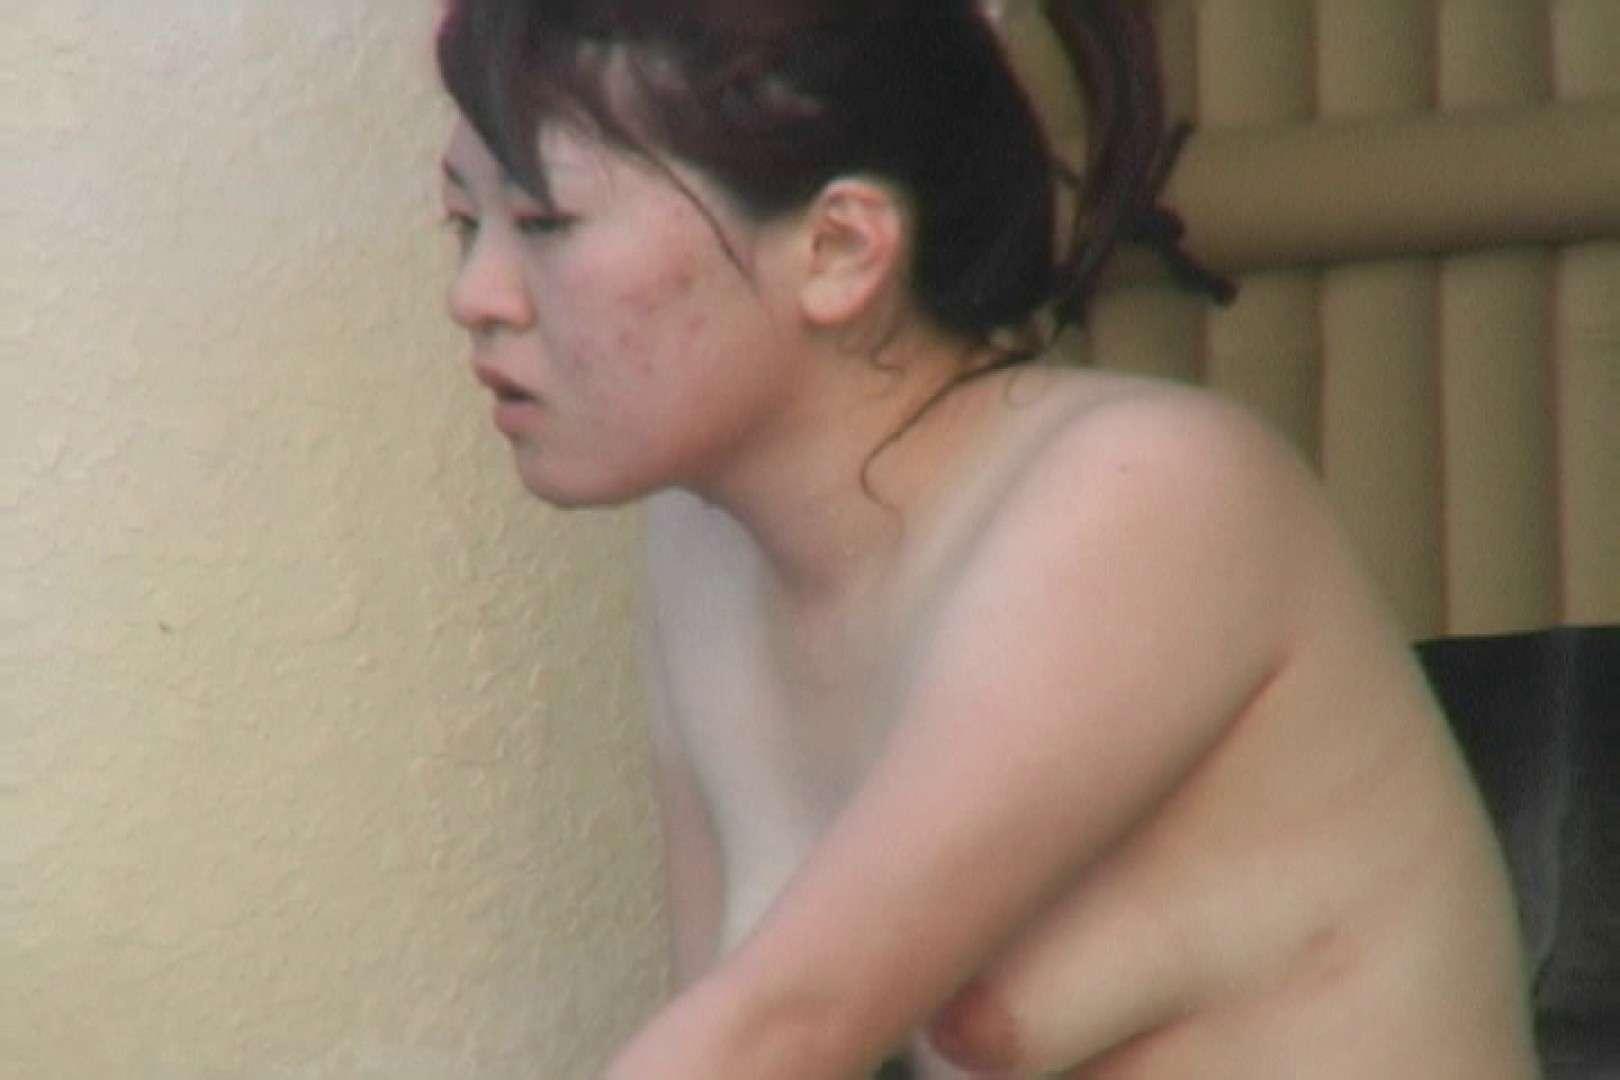 Aquaな露天風呂Vol.115 露天風呂突入   美しいOLの裸体  91pic 37